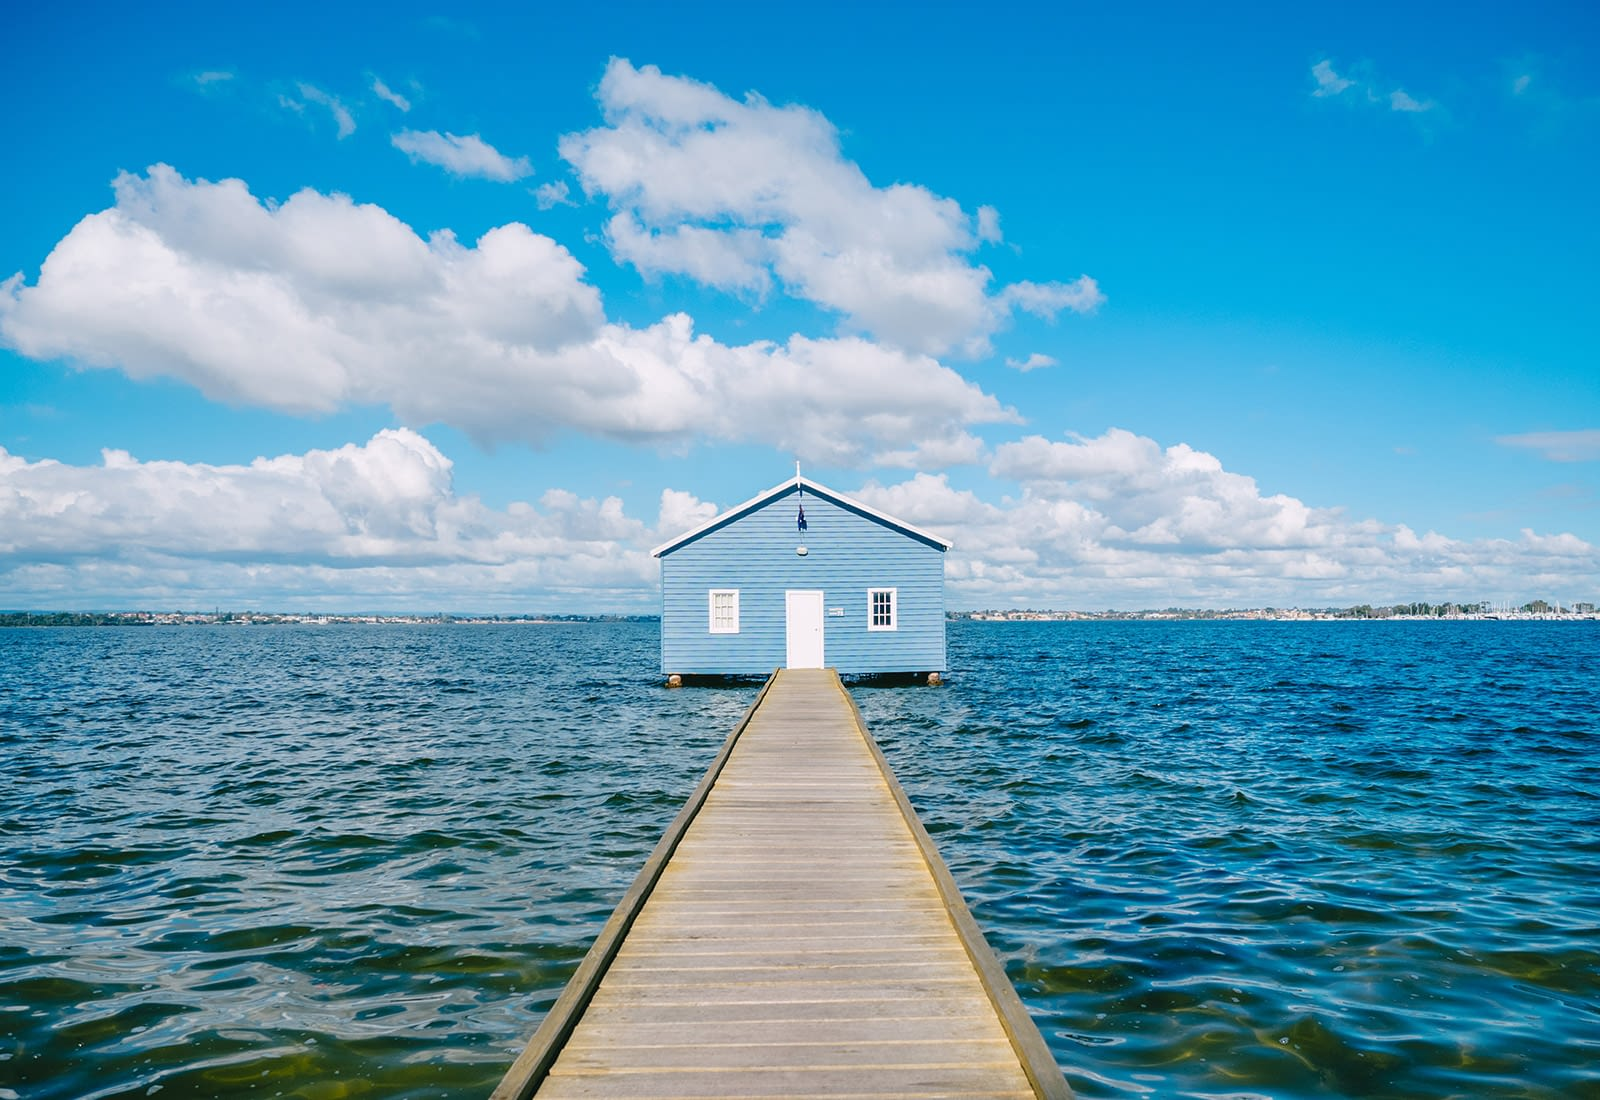 Perth, Australia - Blue Boat House